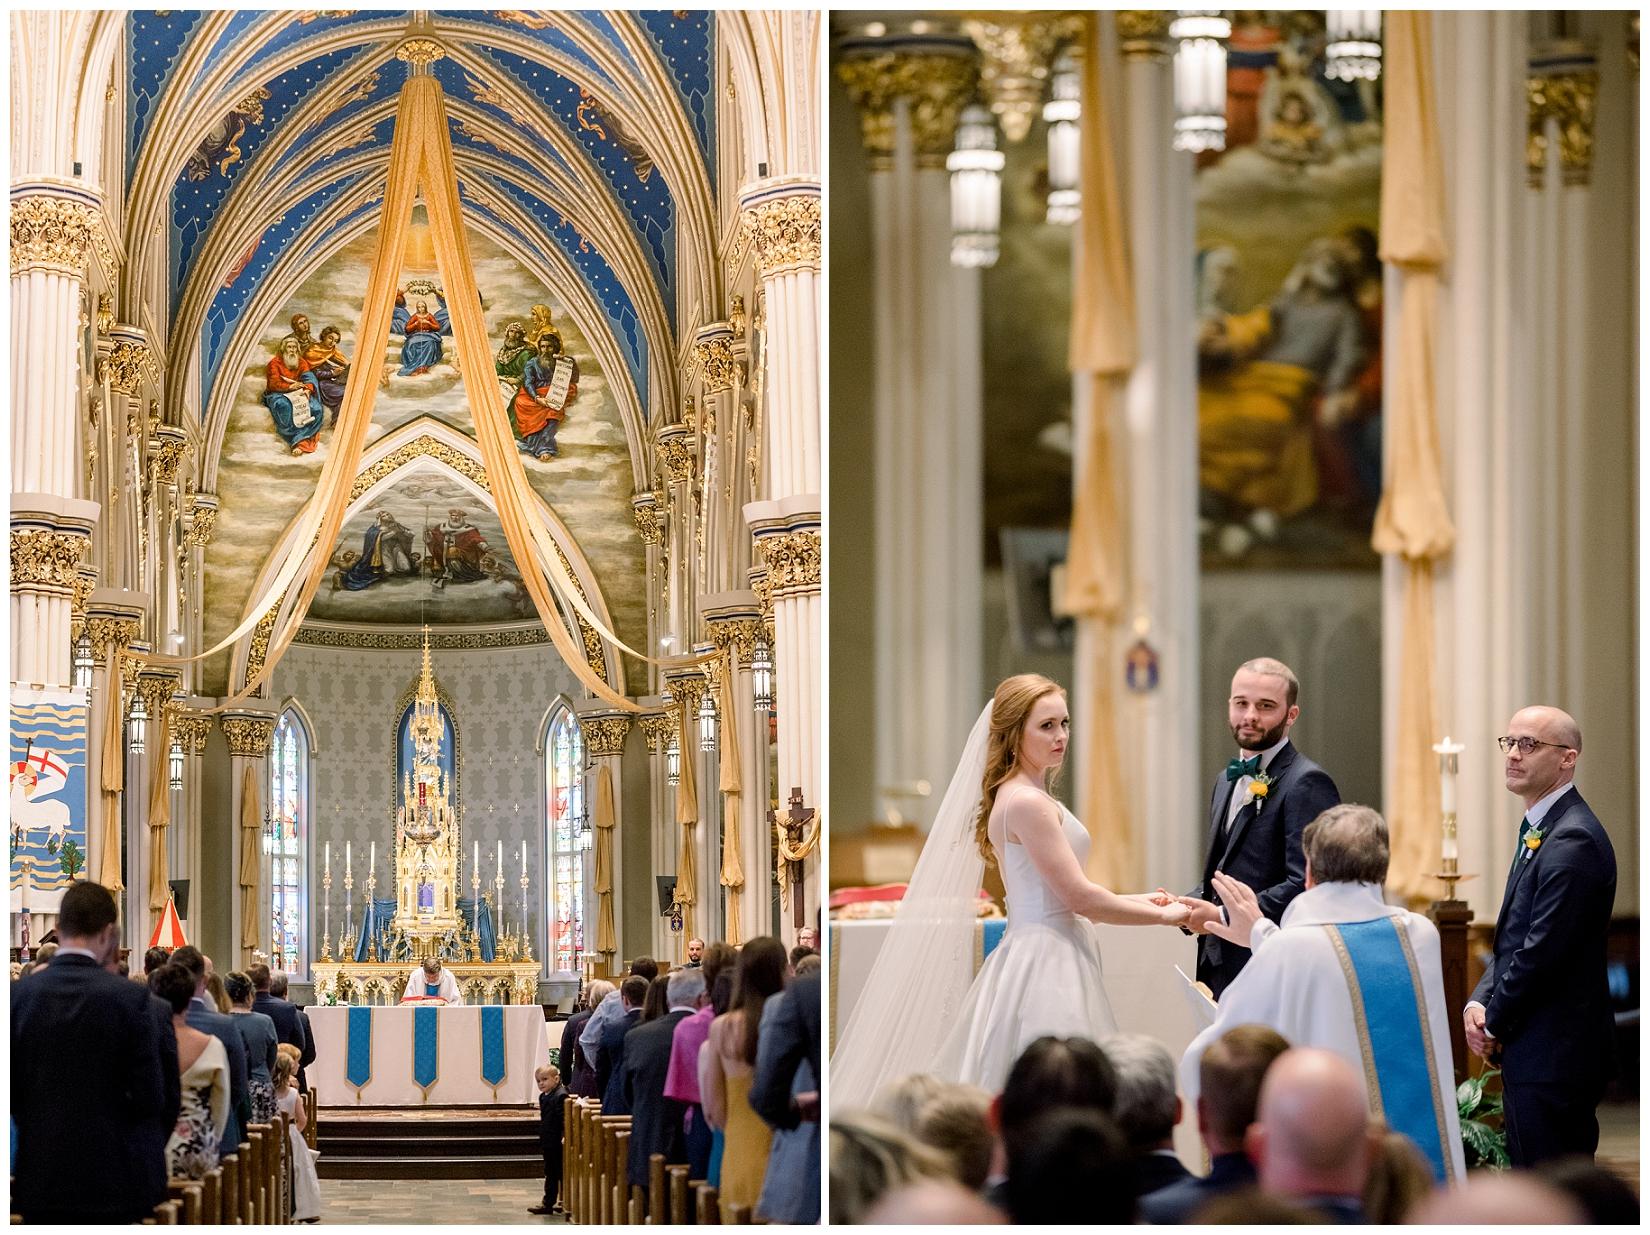 cat-alkire-wedding-photographer-indiana-chicago-indianapolis-fort-wayne_1197.jpg